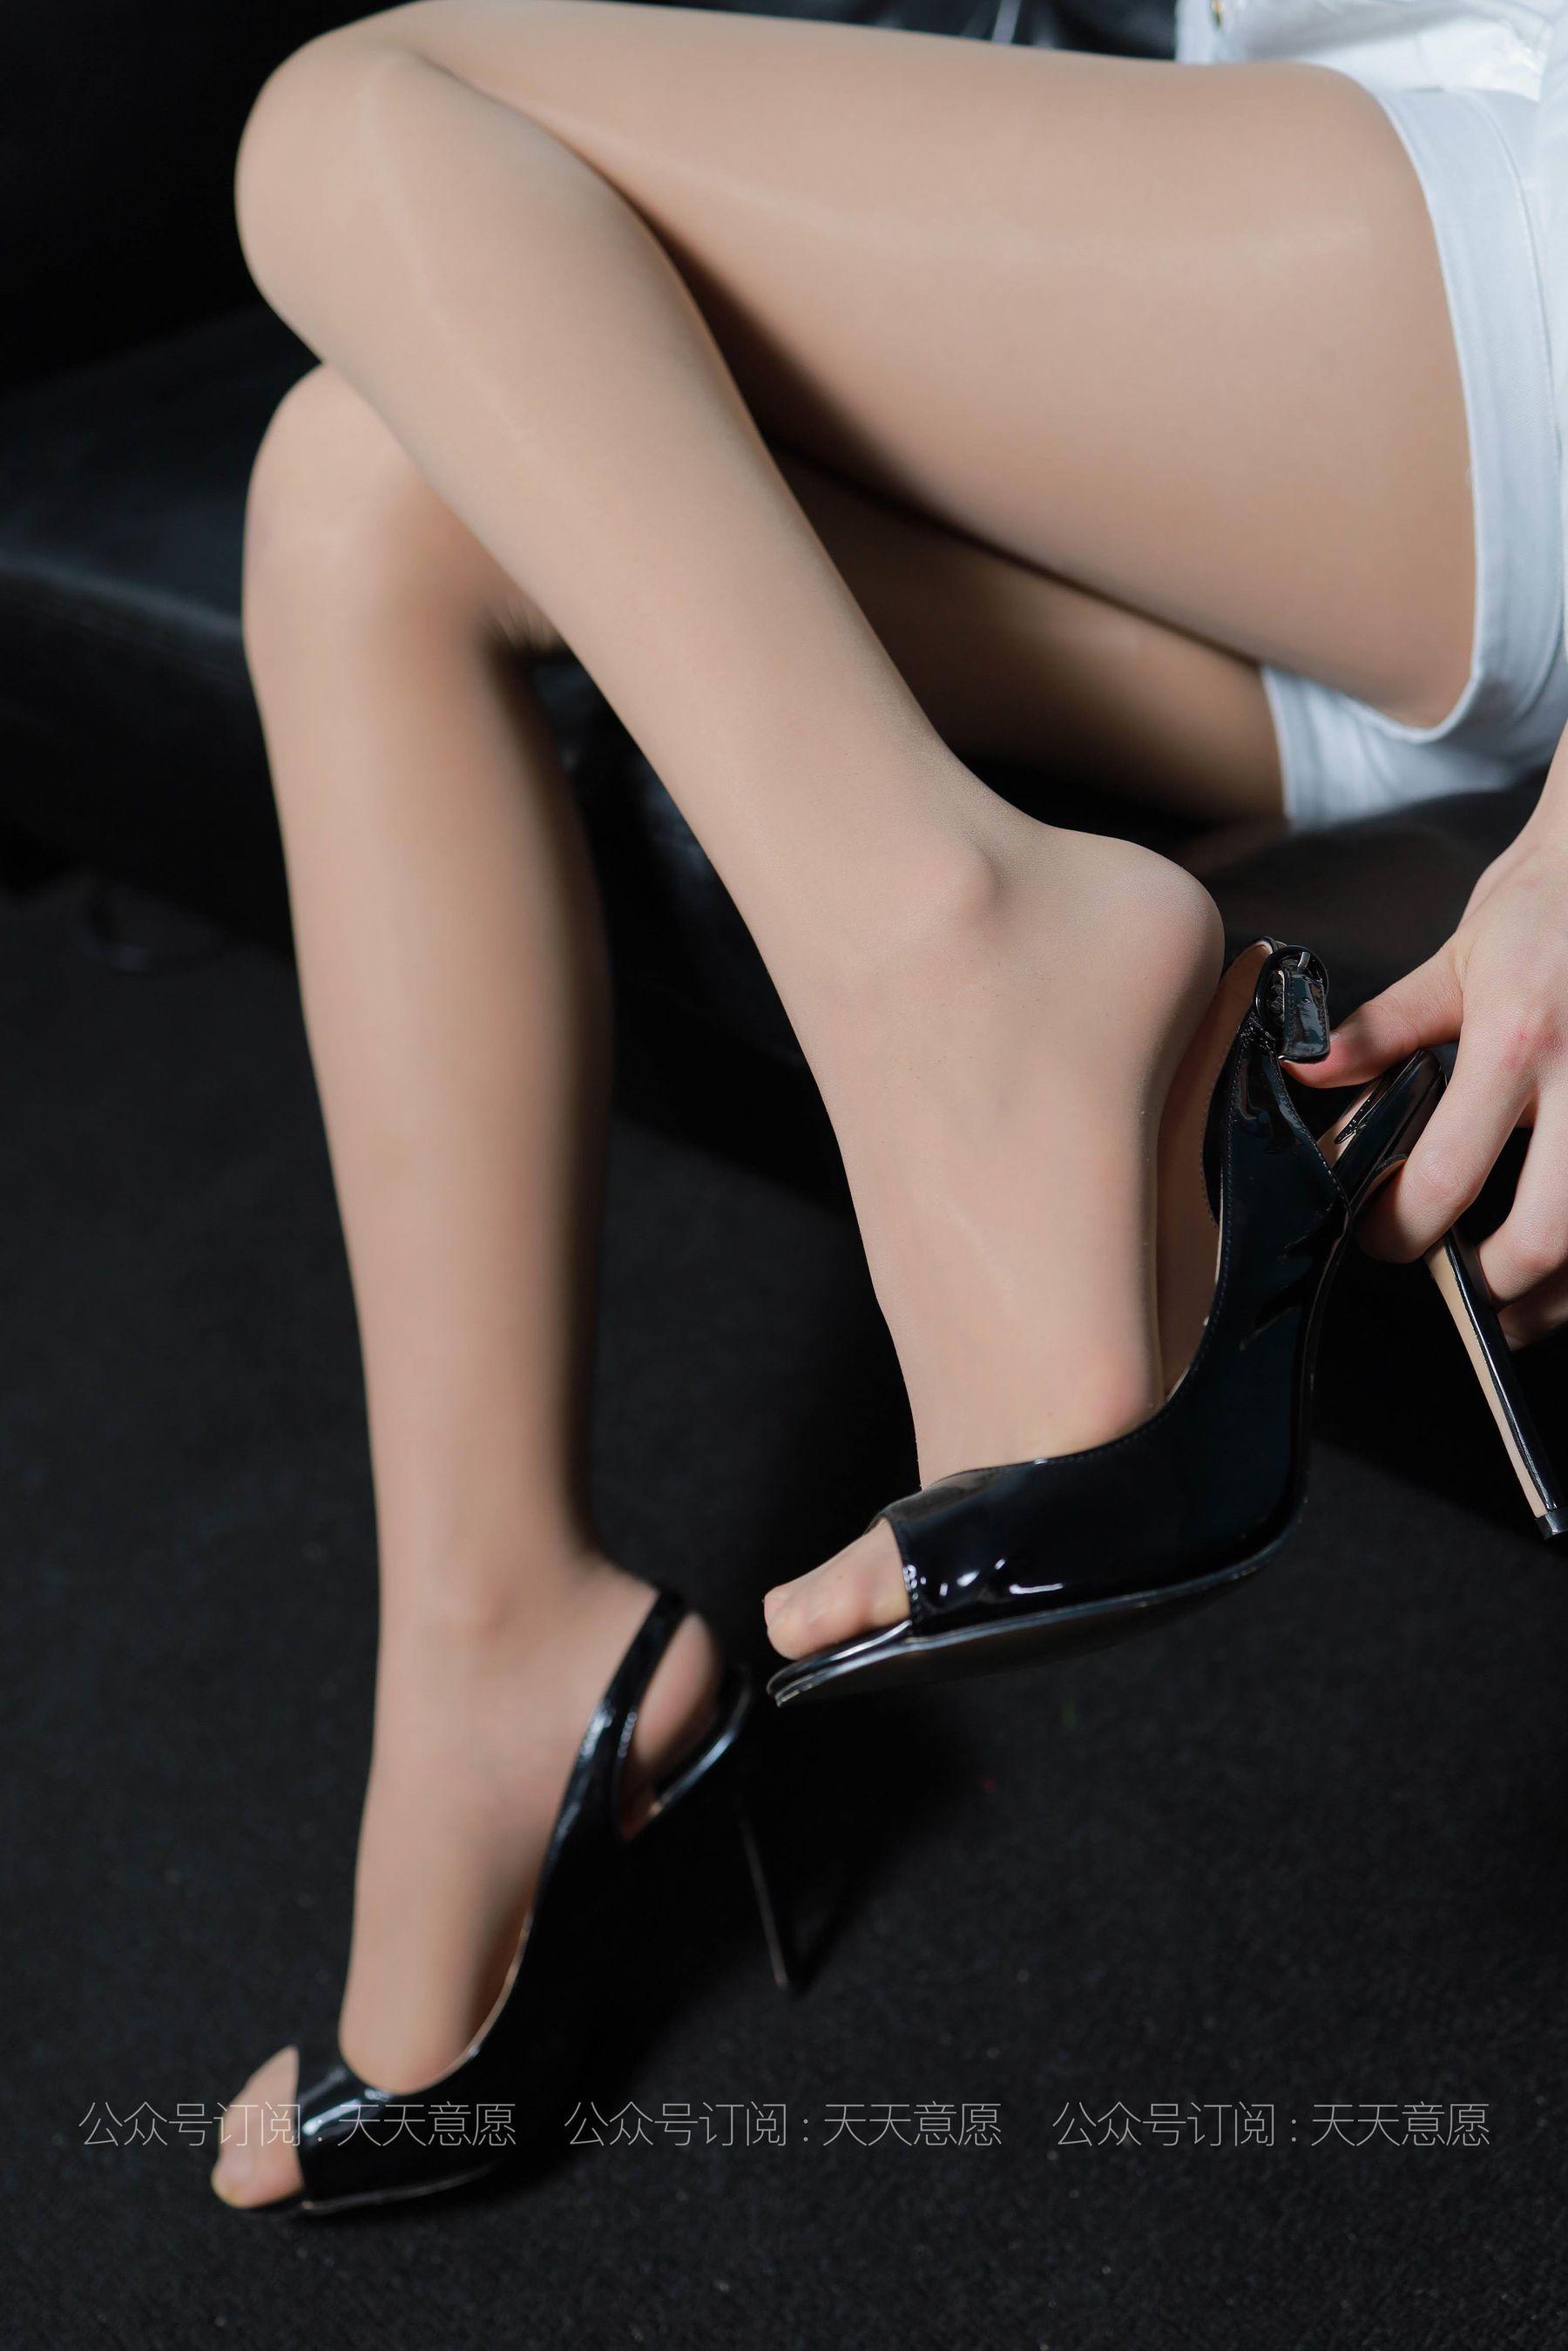 [IESS] 丝享家 768 肉肉《肉肉的白加黑》 丝袜美腿写真[79P]插图(4)